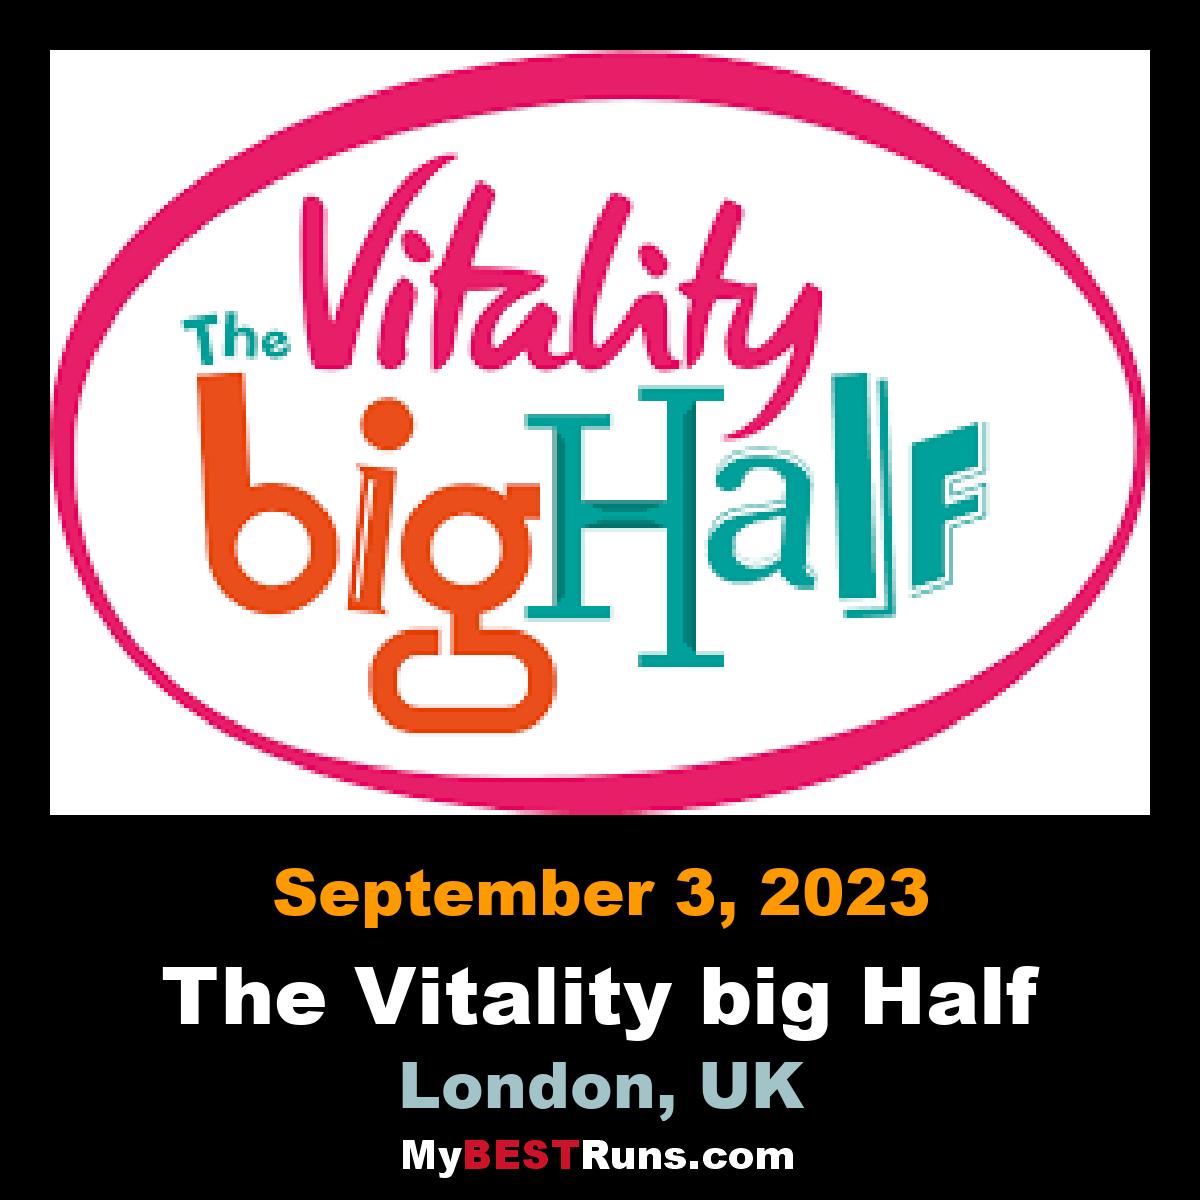 The Vitality Big Half